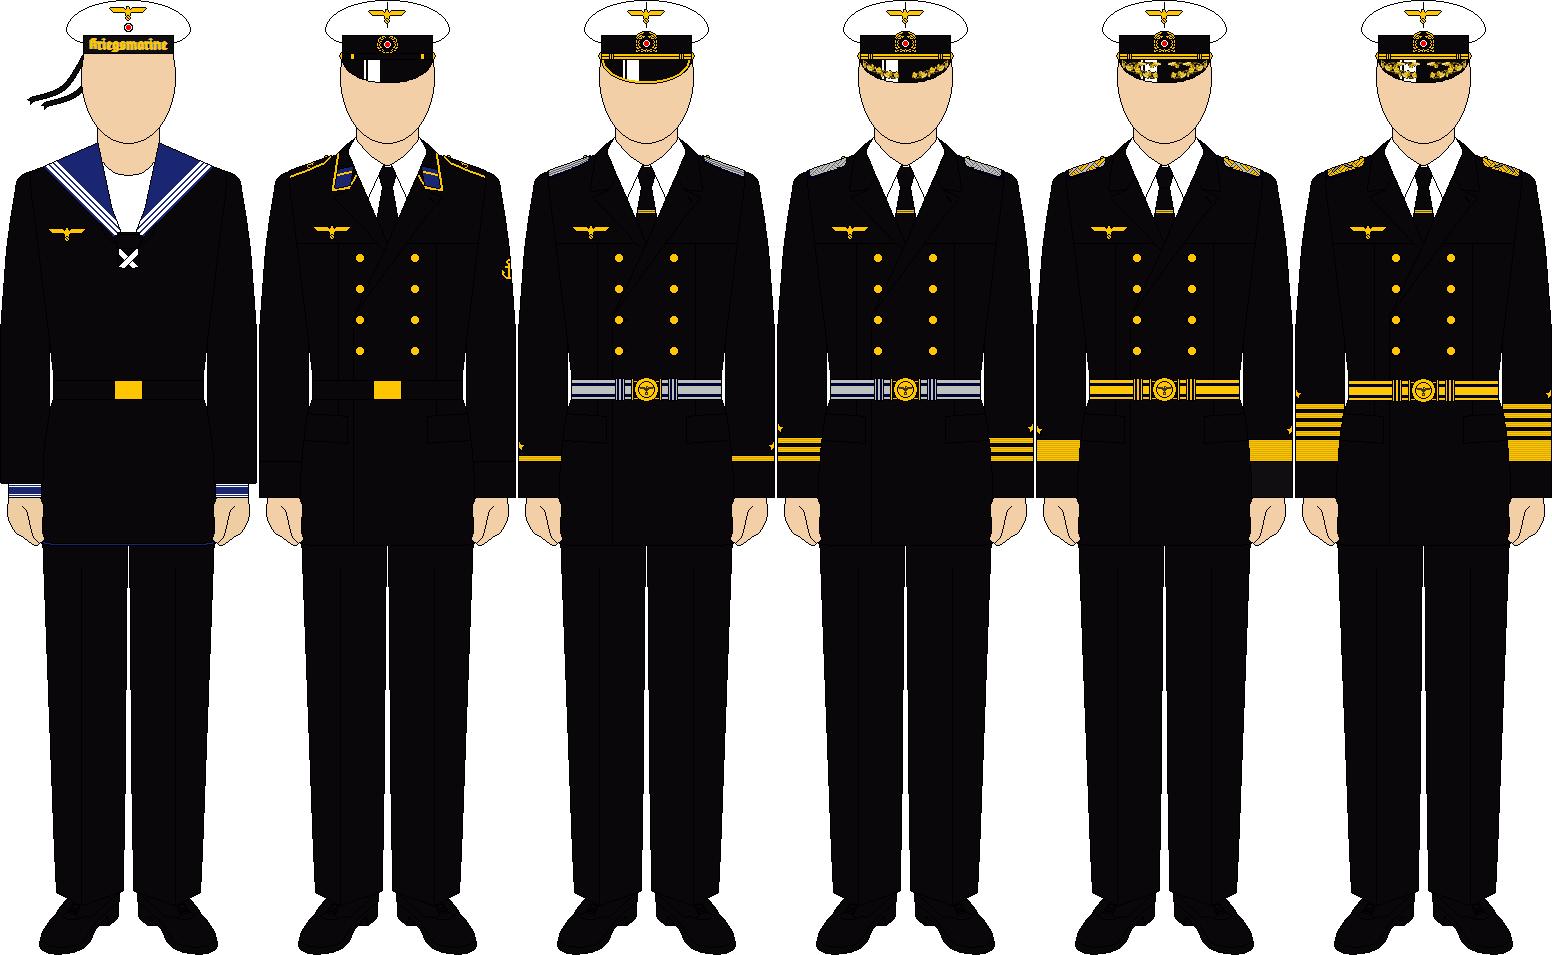 Kriegsmarine winter parade dress by thefalconette-d5audqd